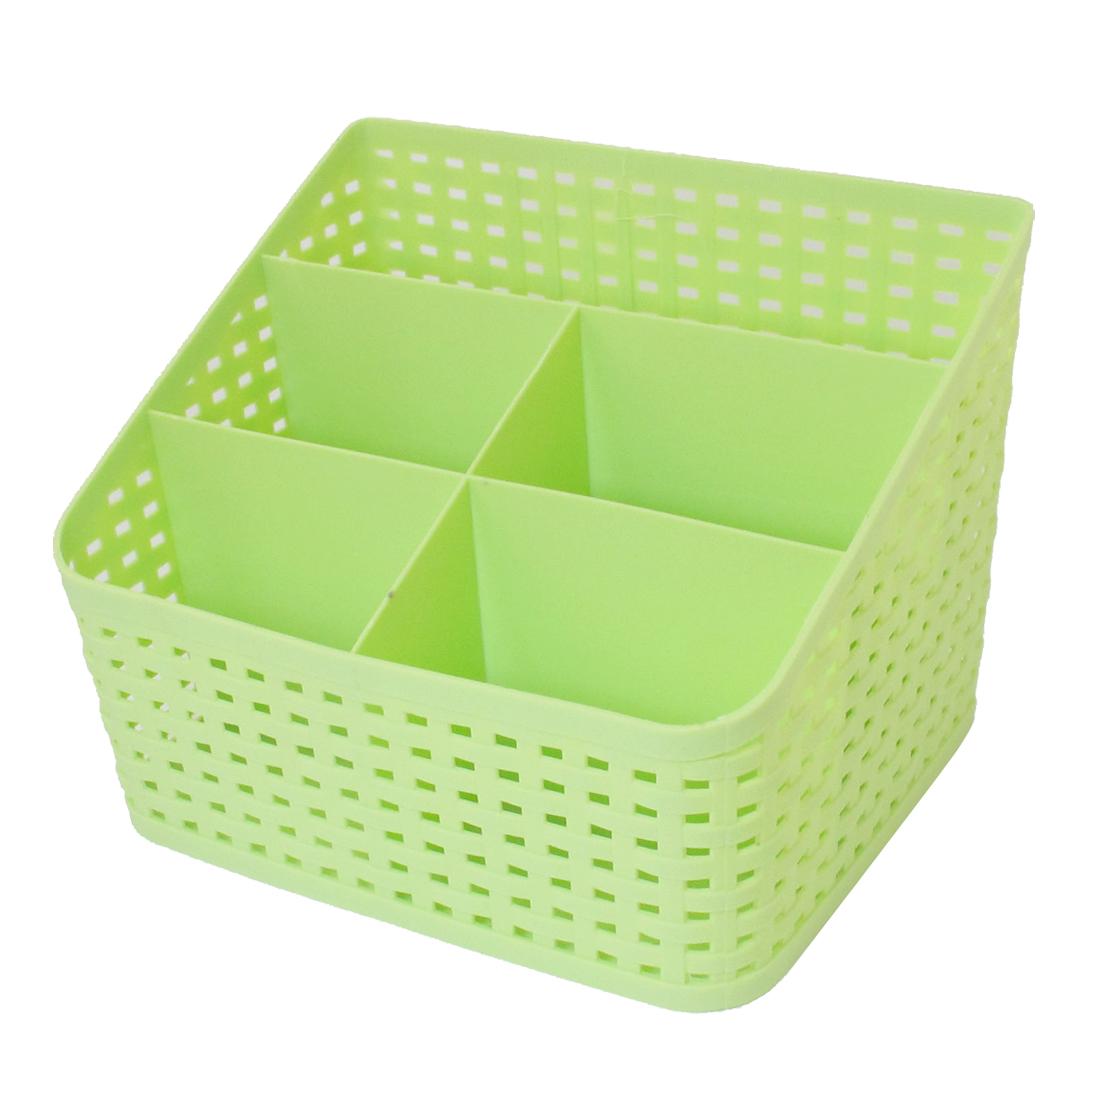 Desktop Sundries Classification 5 Slots Storage Drawer Divider Box Green